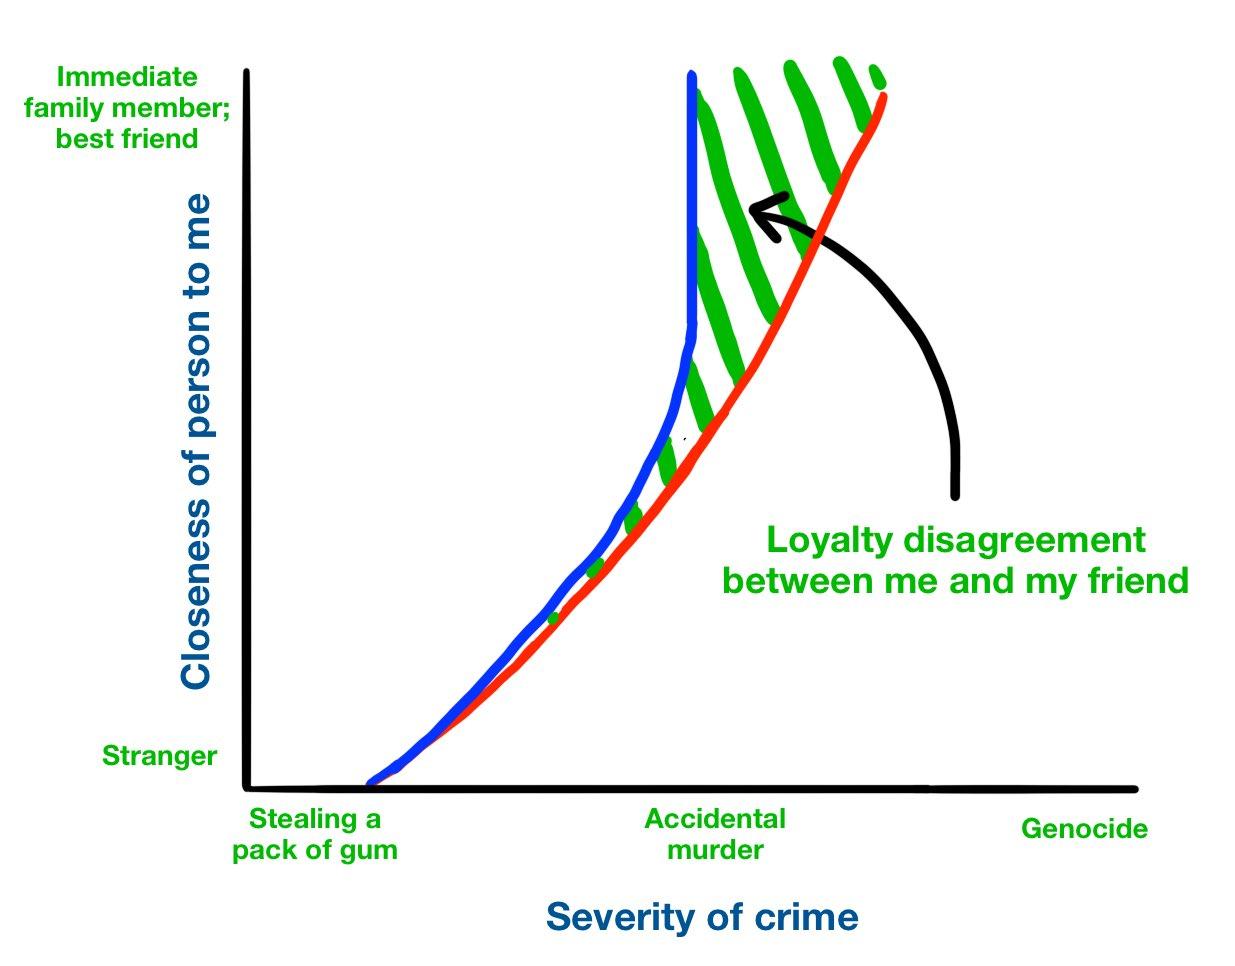 Both graph